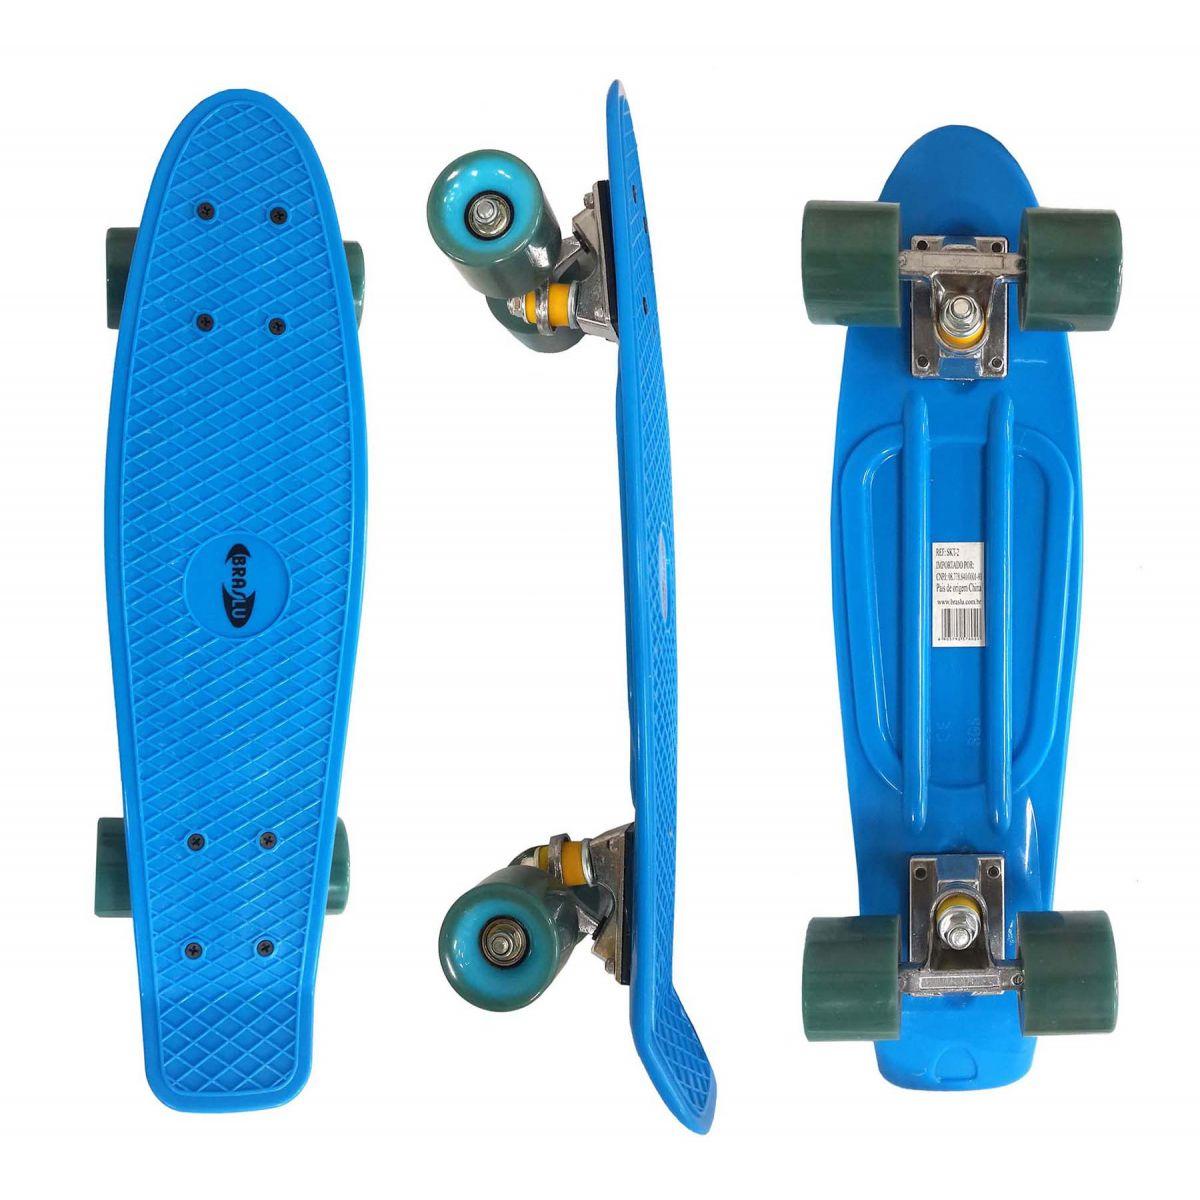 Mini Skate Profissional Truck Blindado Radical Rodas Abec 7 Shape Azul (SKT-2)